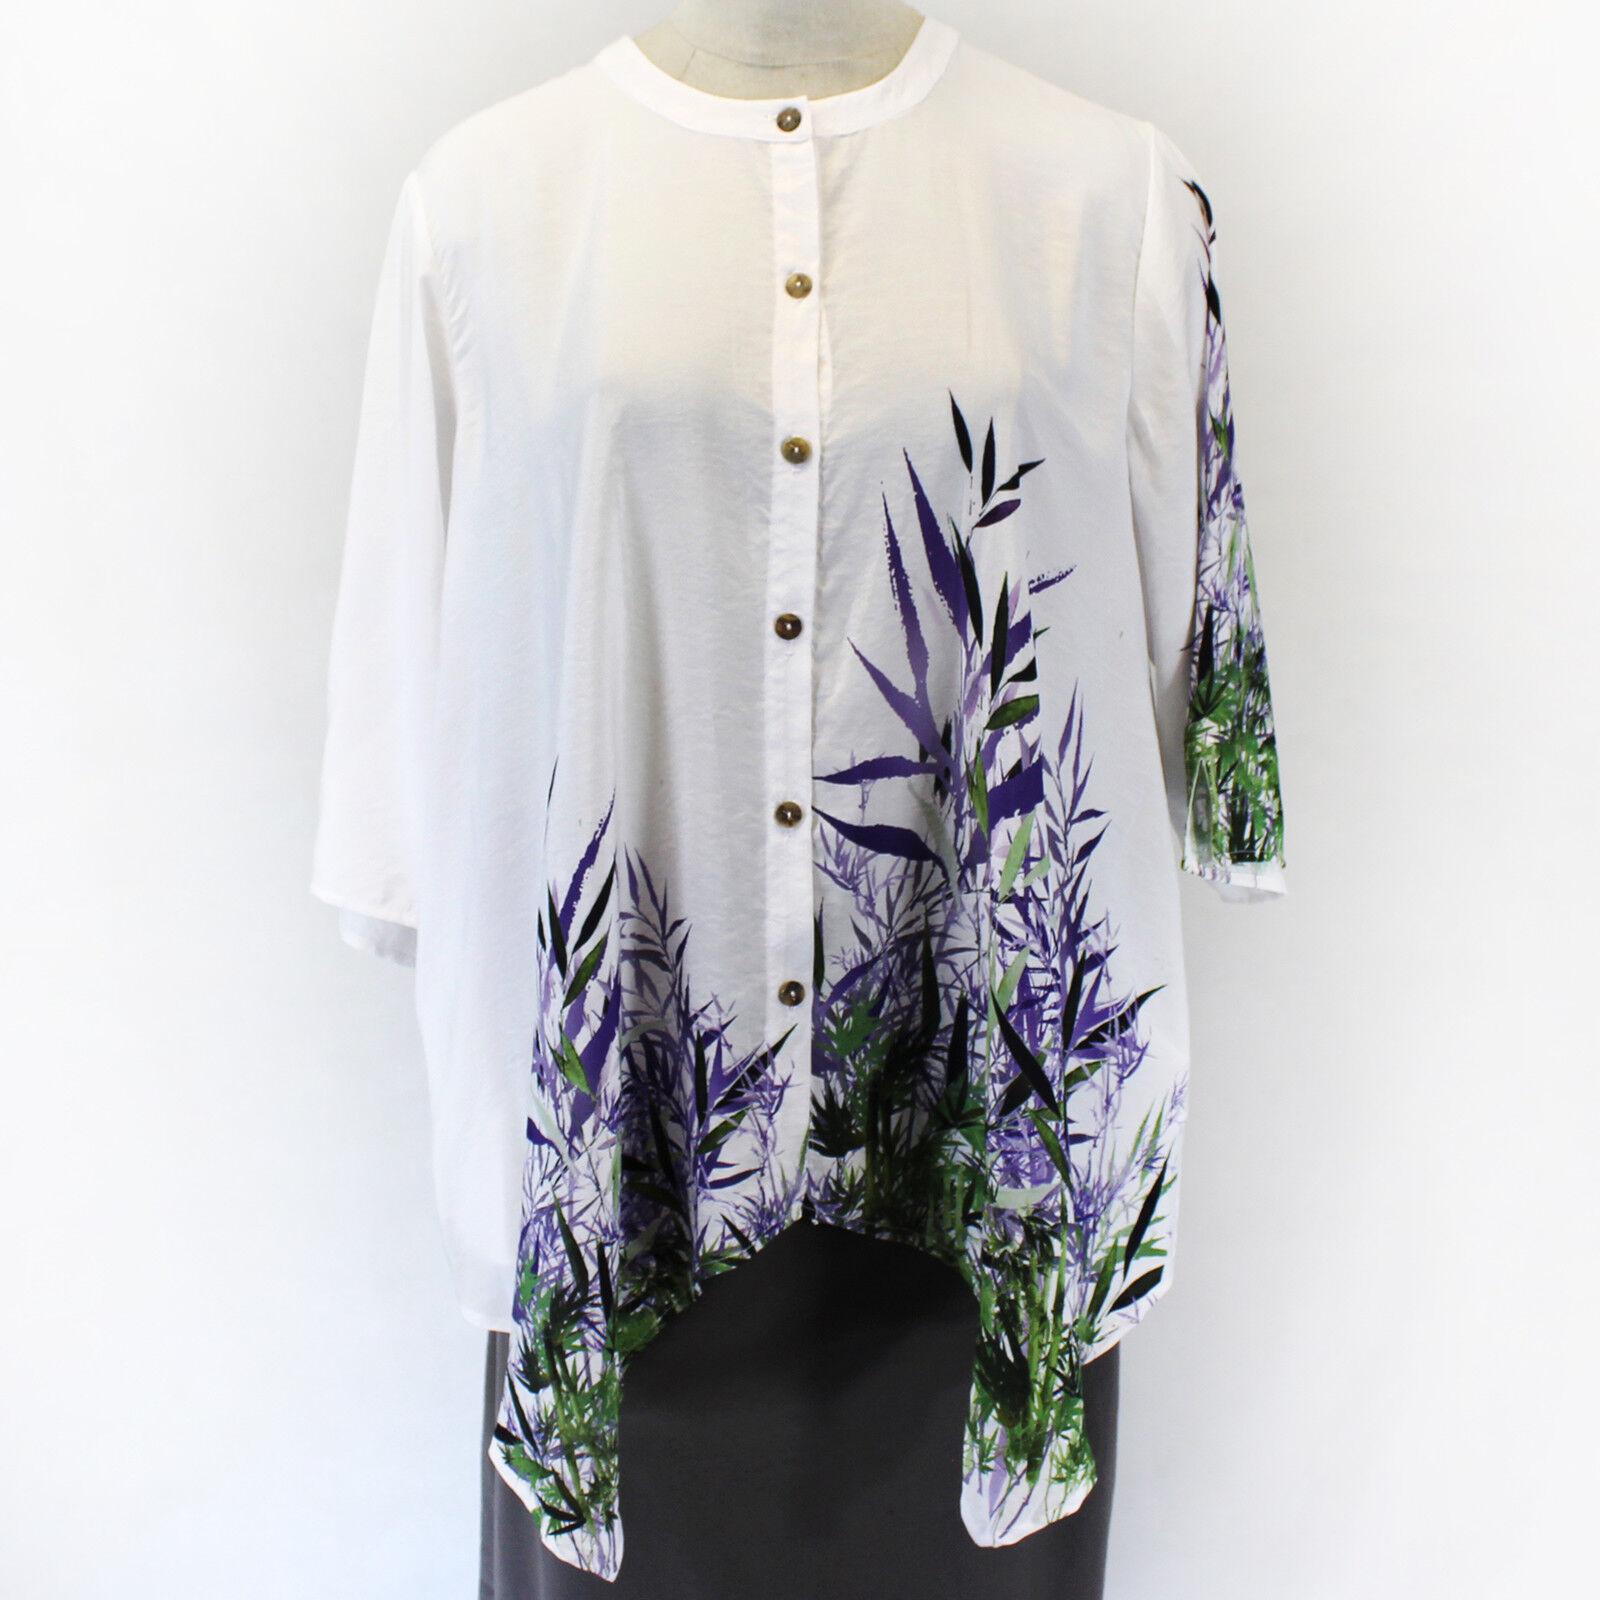 Citron Clothing Japanese Art Lavender Bamboo Blouse Tops w Pockets Plus 3X